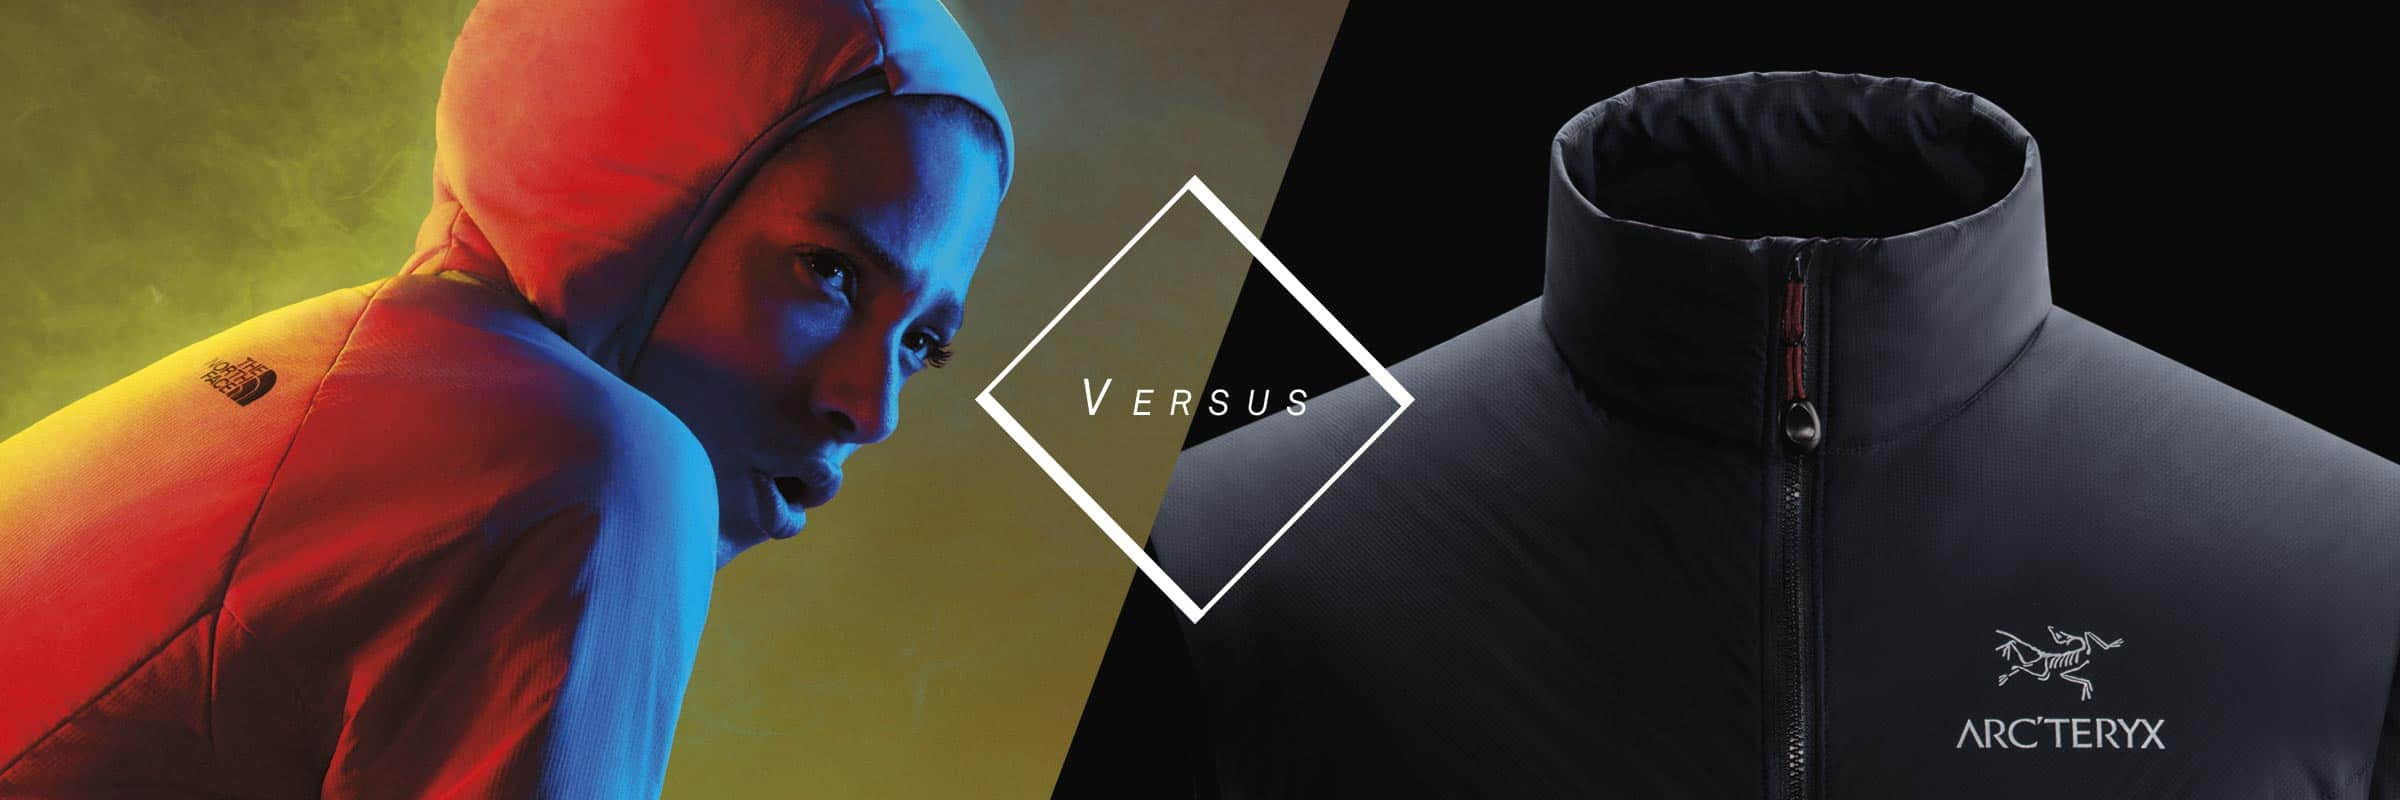 Arc'teryx, The North Face. Arc'teryx Atom LT VS The North Face Ventrix™